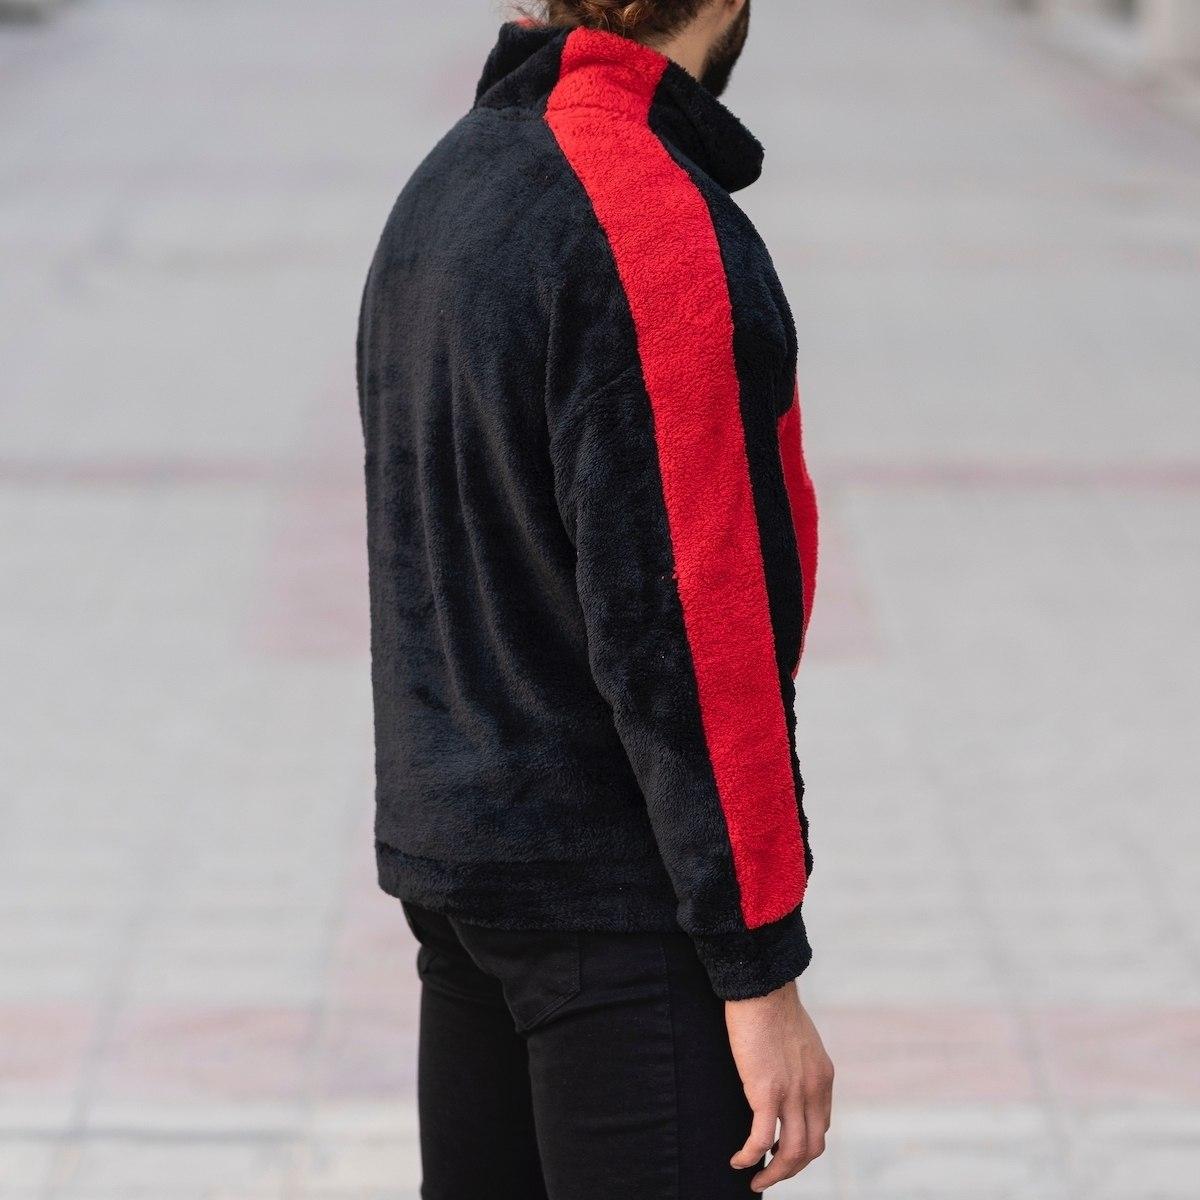 Well-Soft SweatShirt in Black&Red Mv Premium Brand - 5